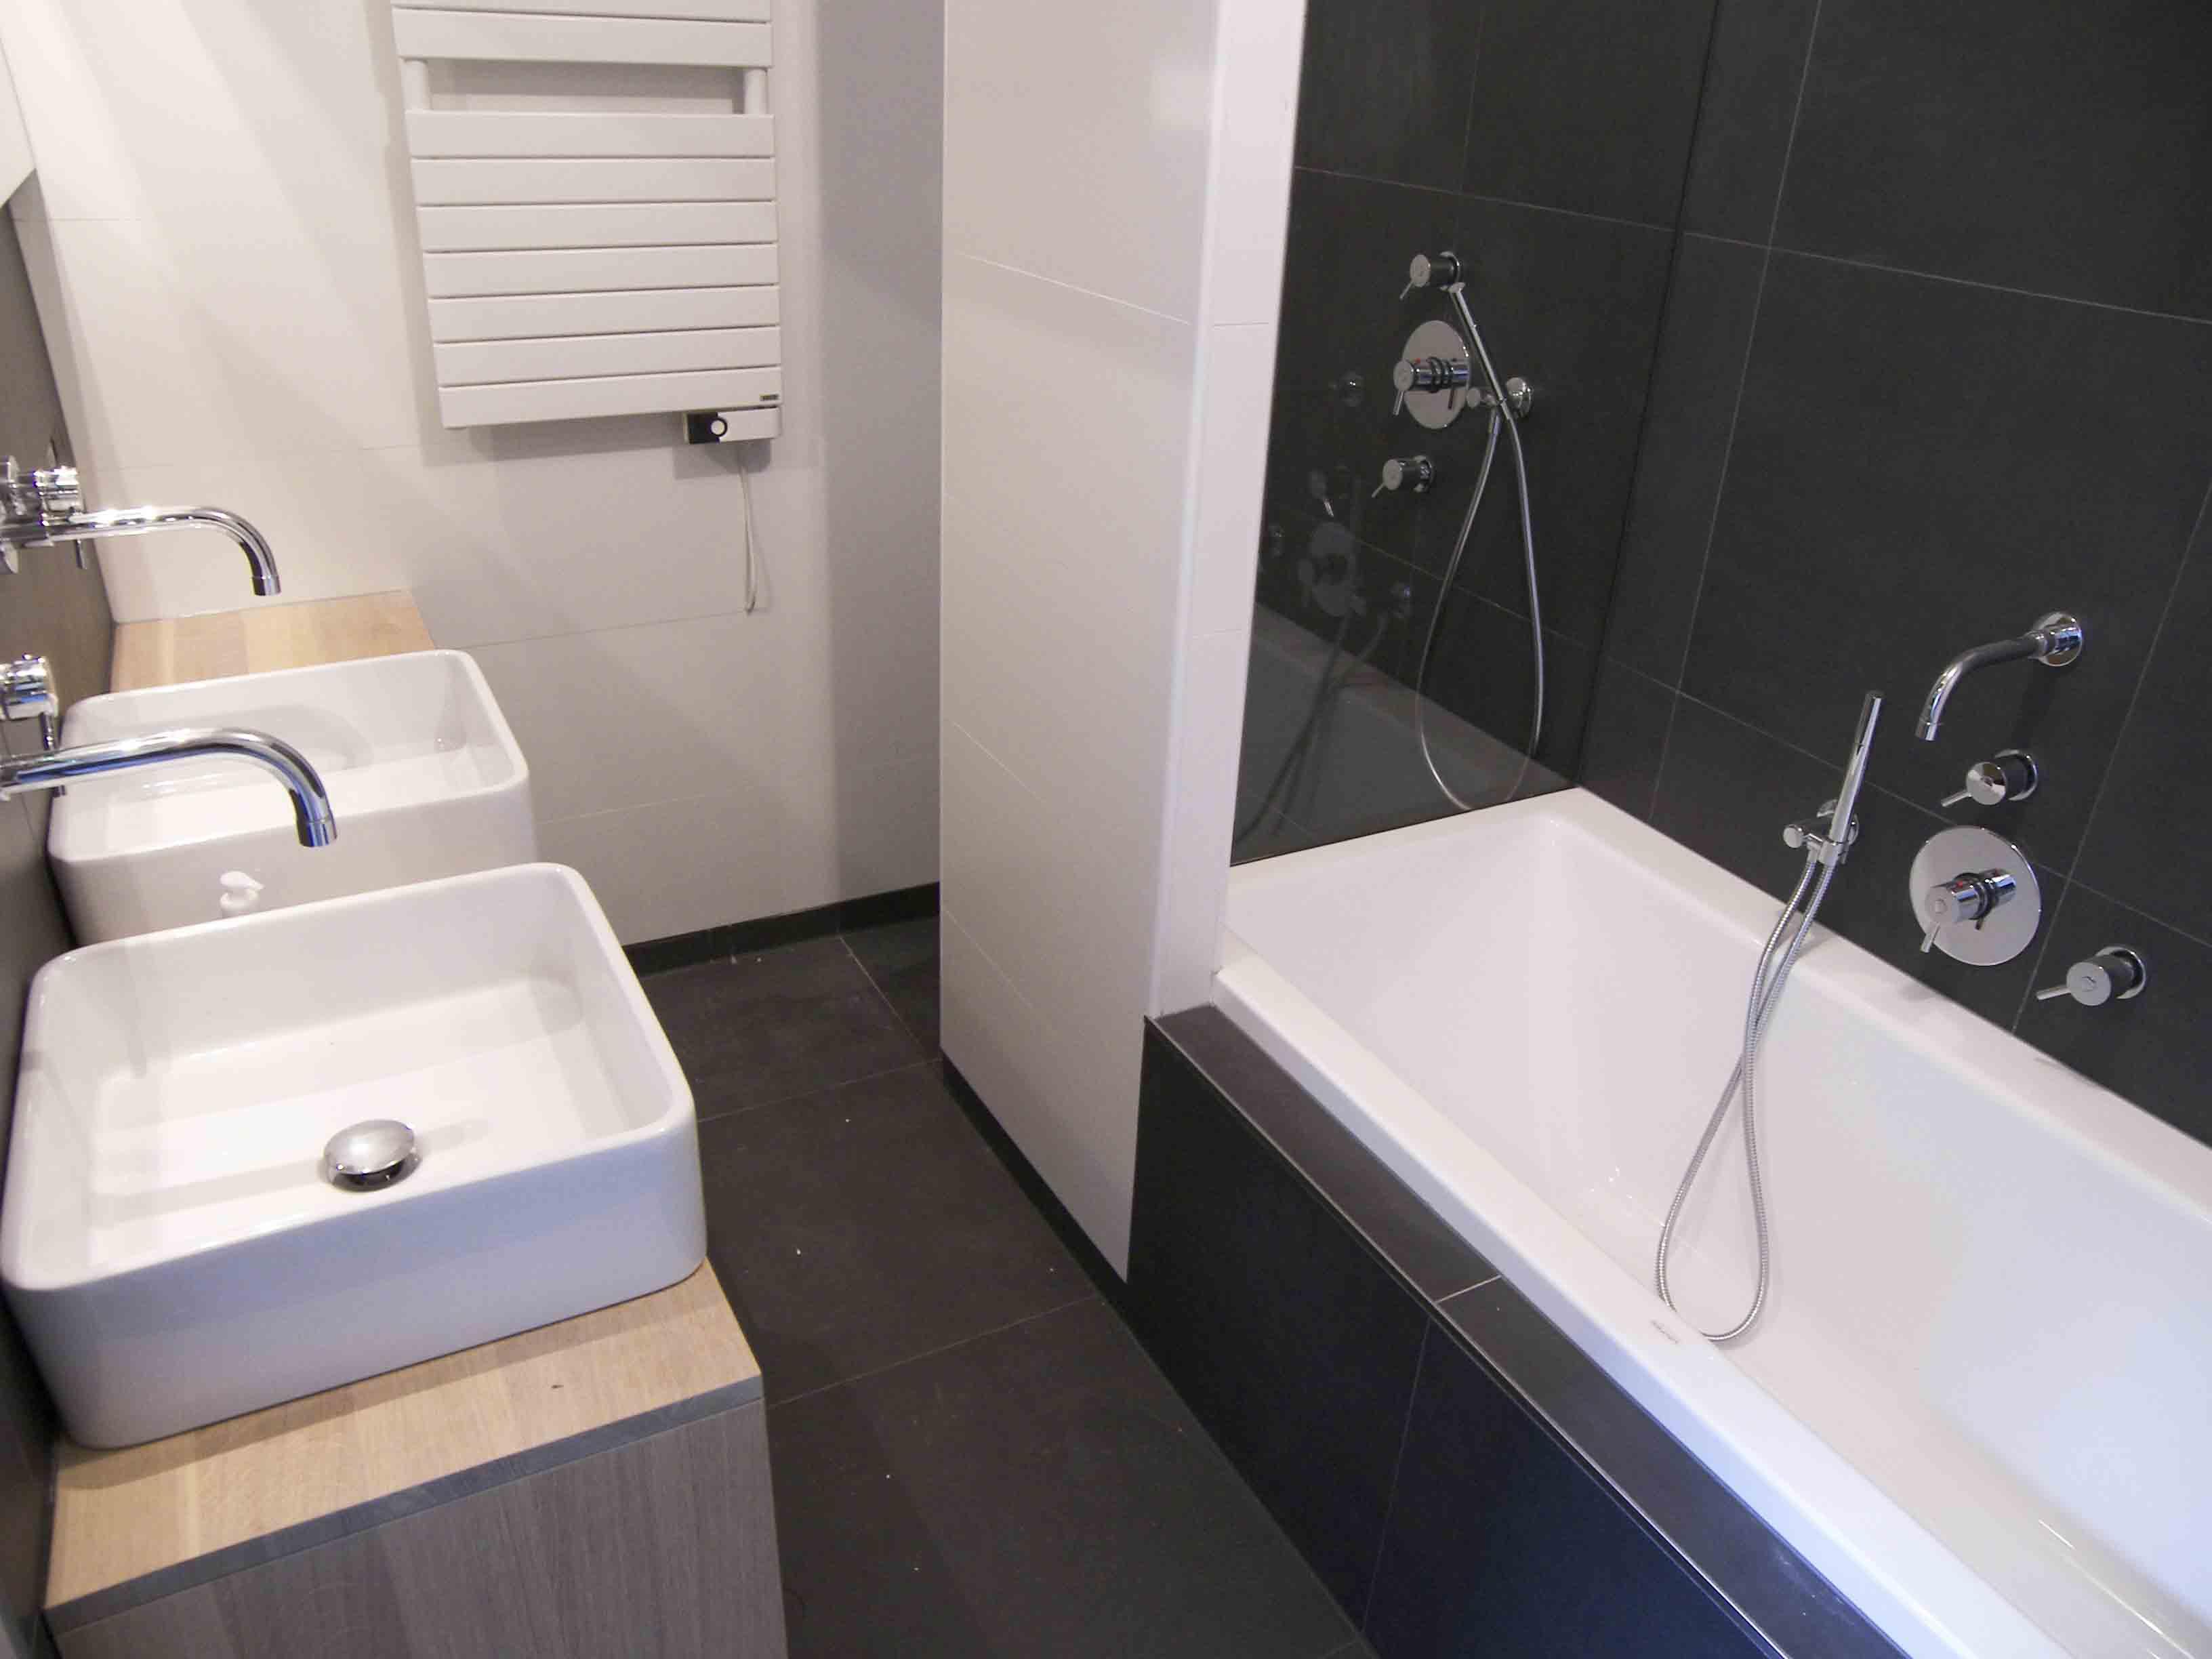 Badkamers Etten Leur : Badkamer te etten leur bouw en visie